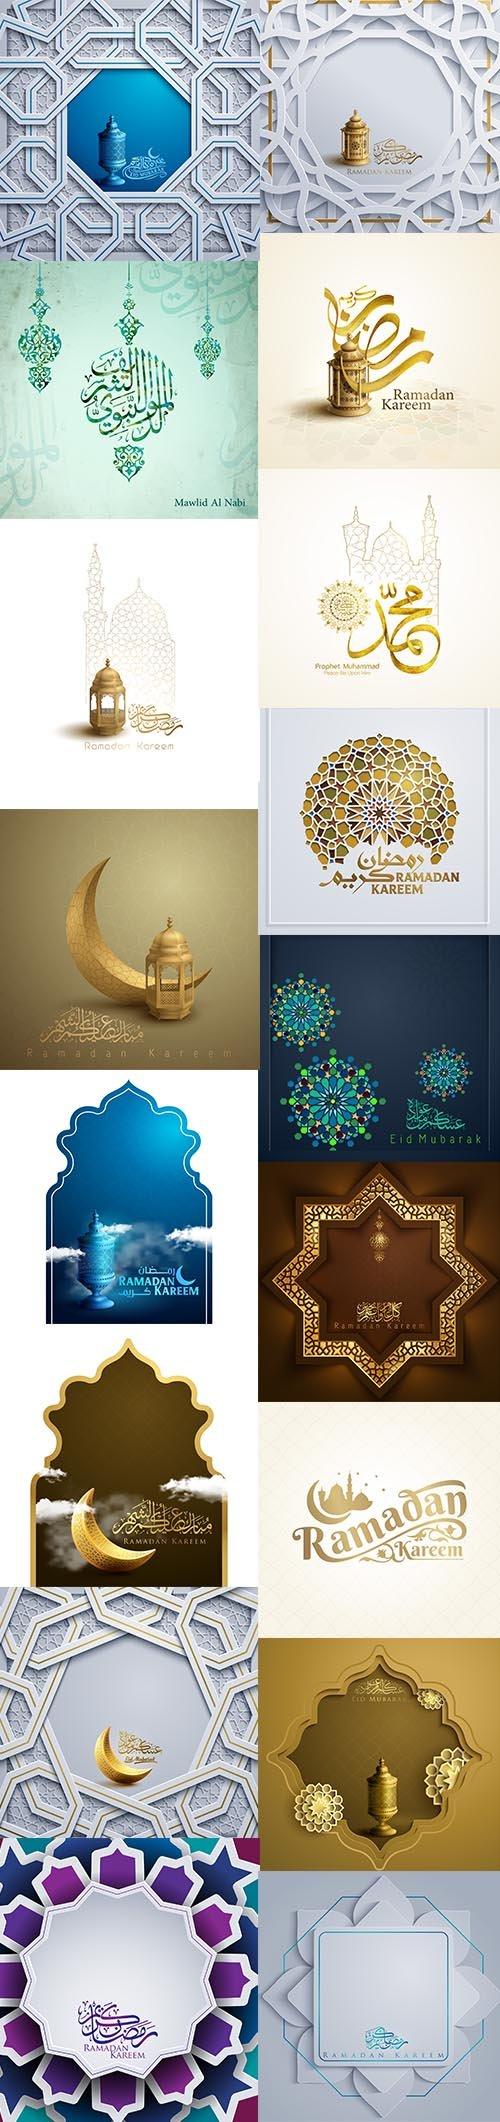 Islamic Banner Eid Mubarak and Ramadan Kareem Greeting Vector Background